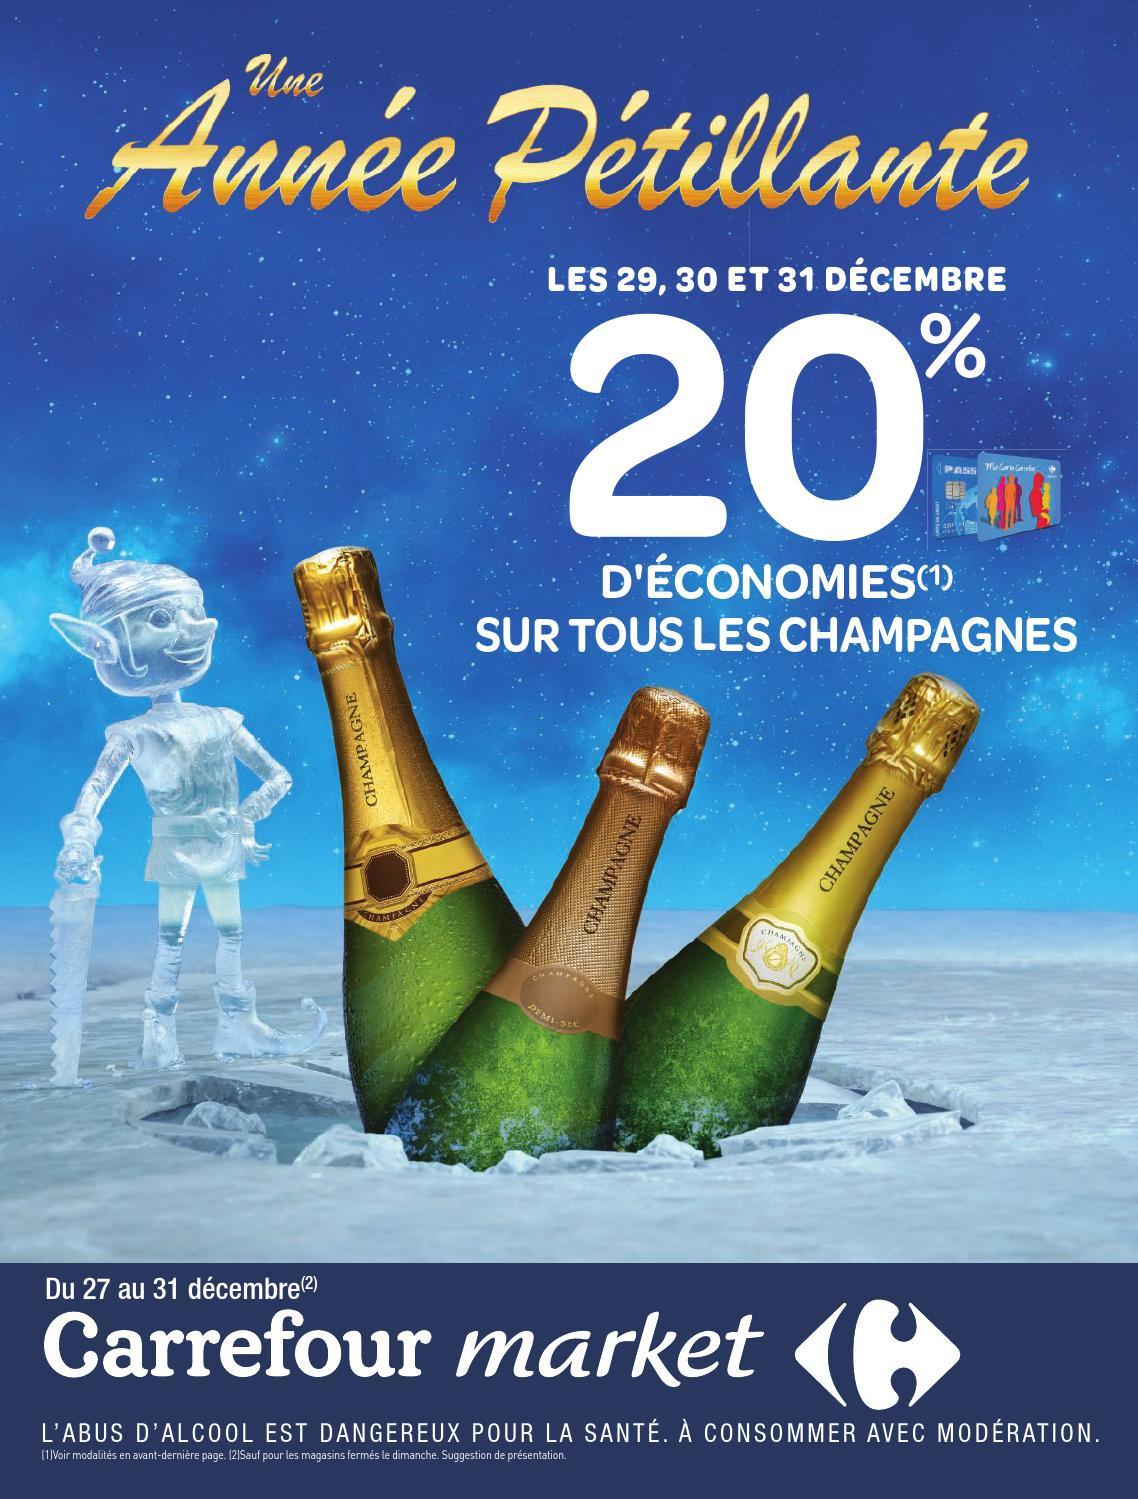 Catalogue Carrefour Market - 27-31.12.2013 by joe monroe - issuu f0b53c8d02b